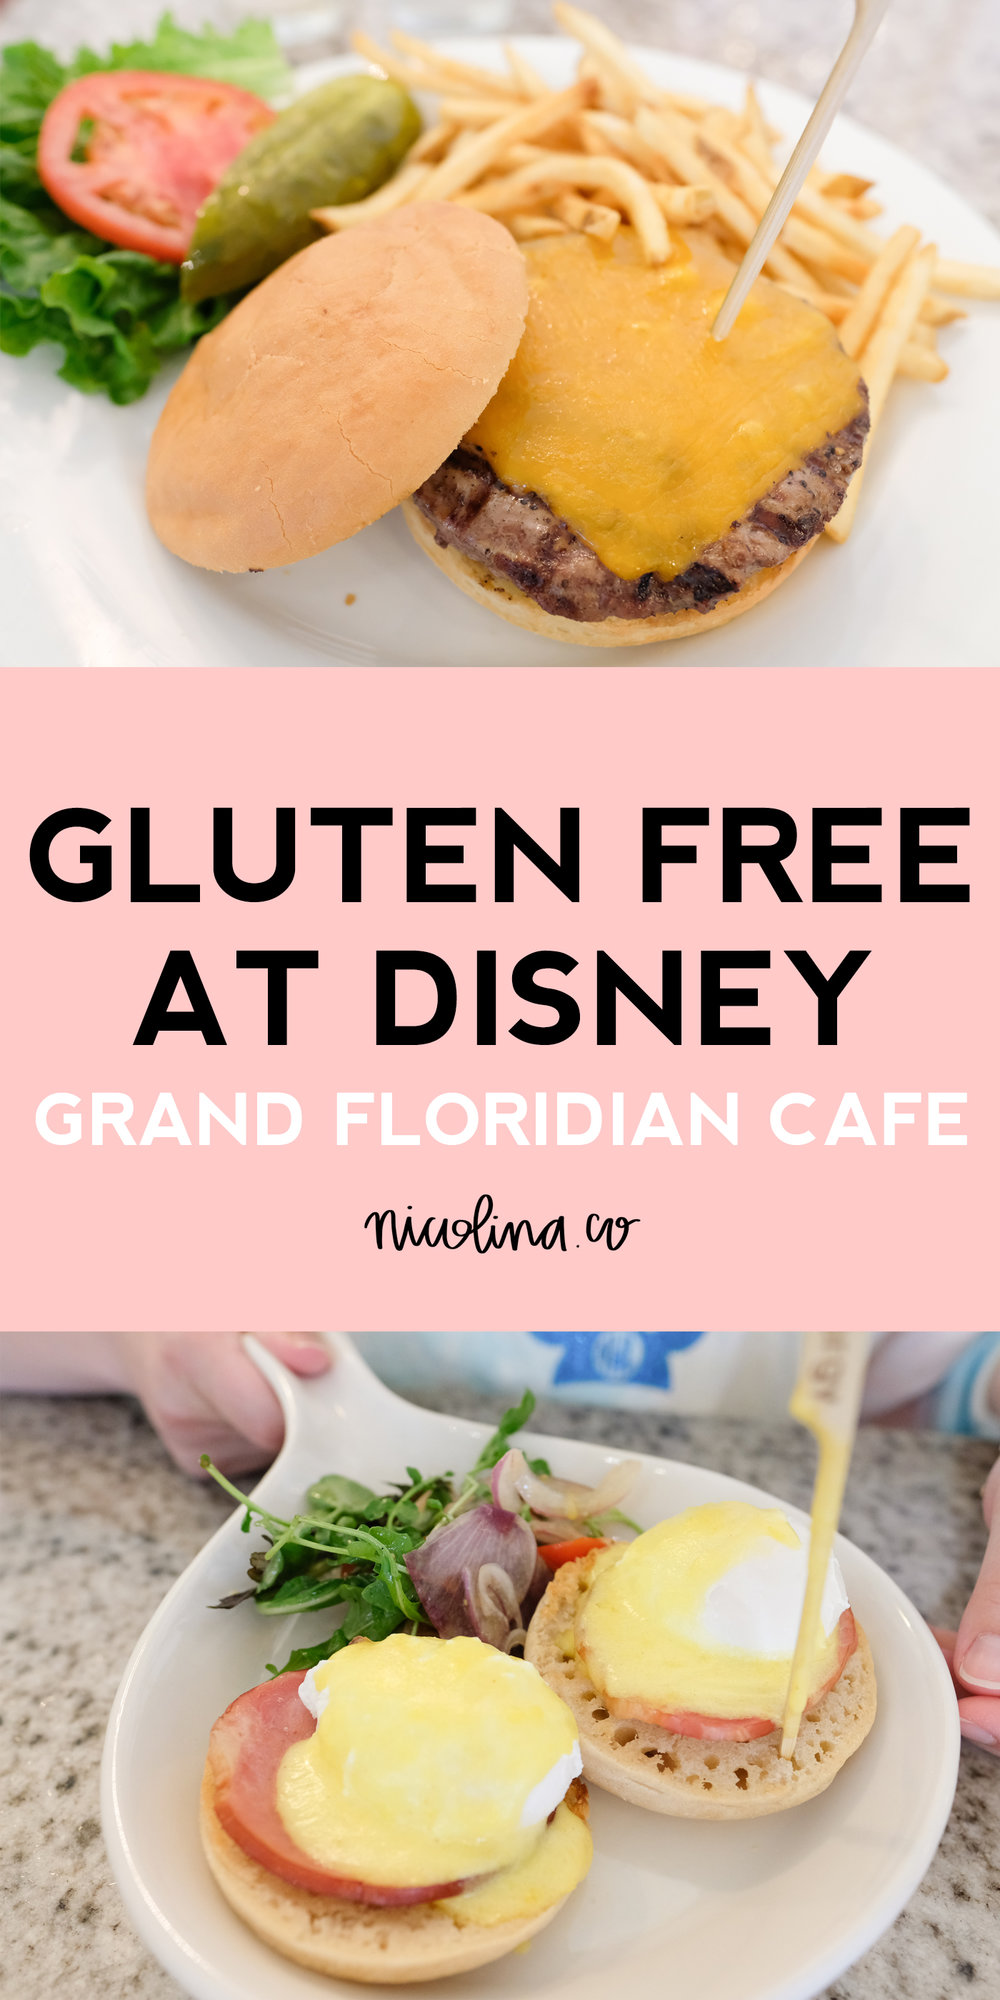 Gluten Free at Walt Disney World - Grand Floridian Cafe